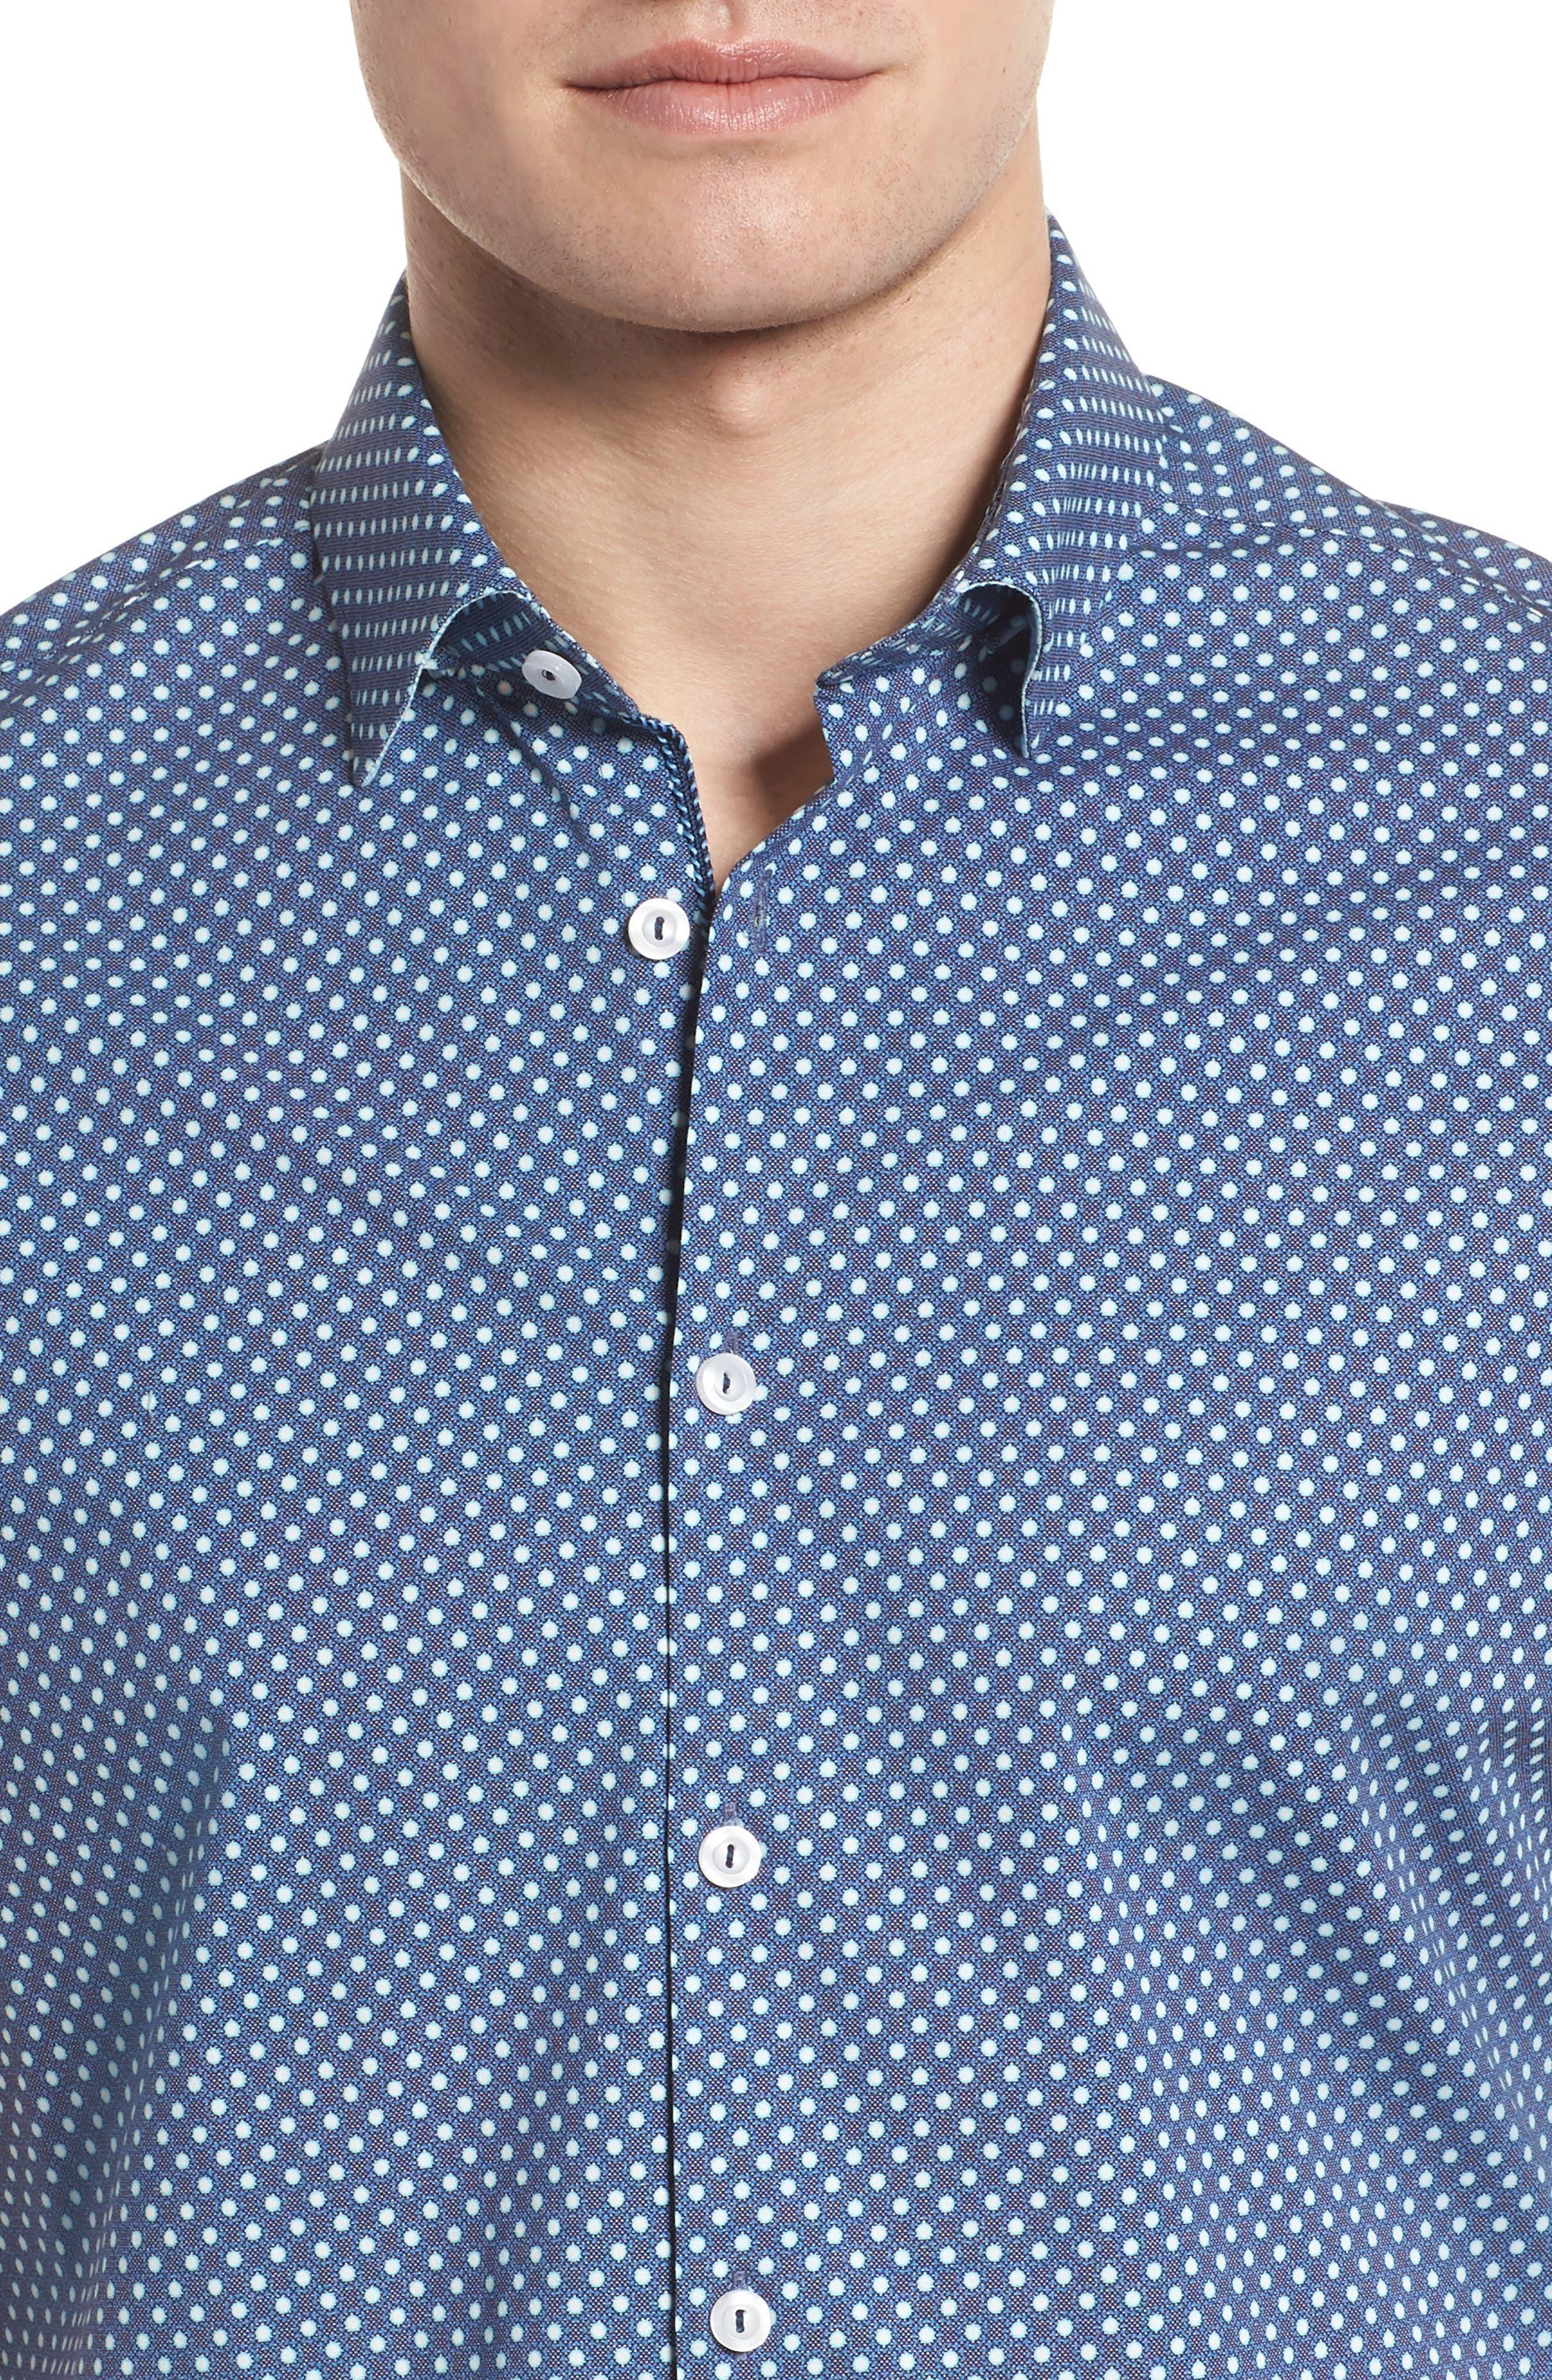 Woven Sport Shirt,                             Alternate thumbnail 4, color,                             NAVY